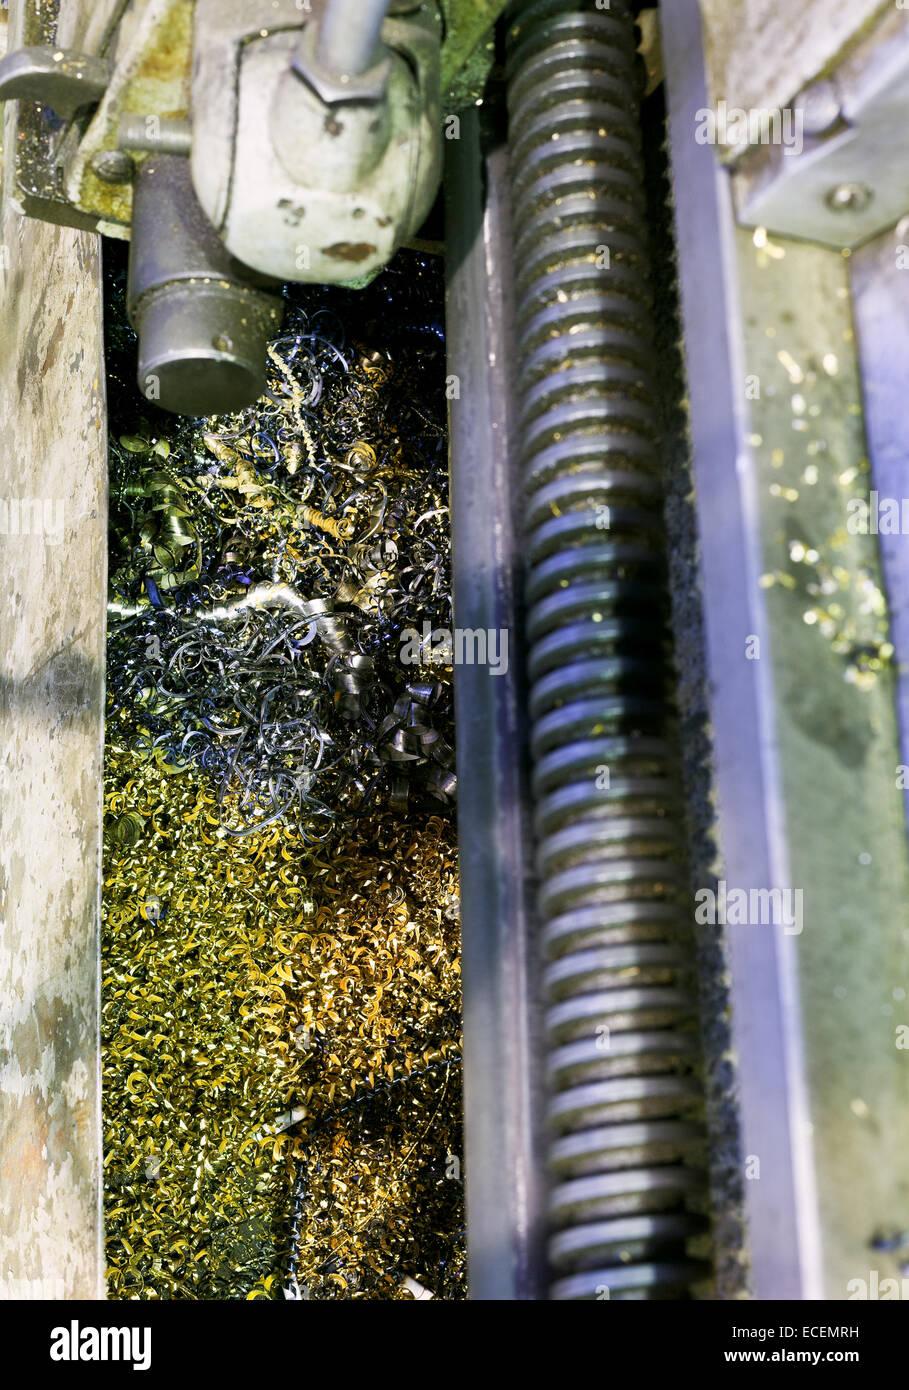 metal turnings in sump of lathe machine close up - Stock Image